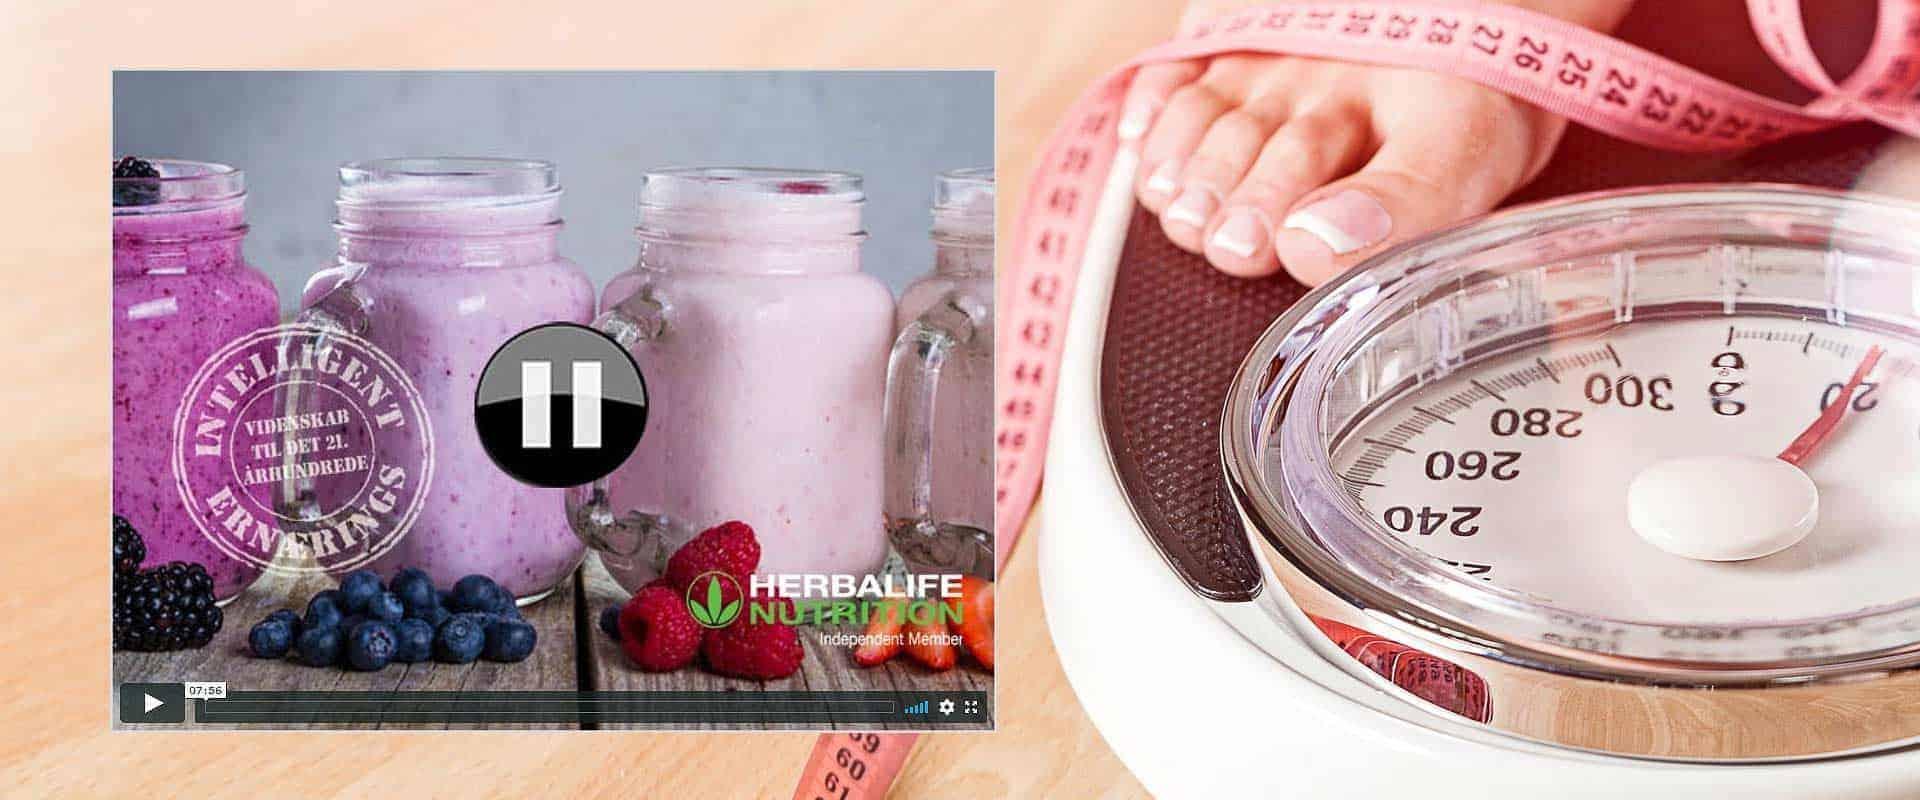 Video om Herbalifes ernæringsprodukter